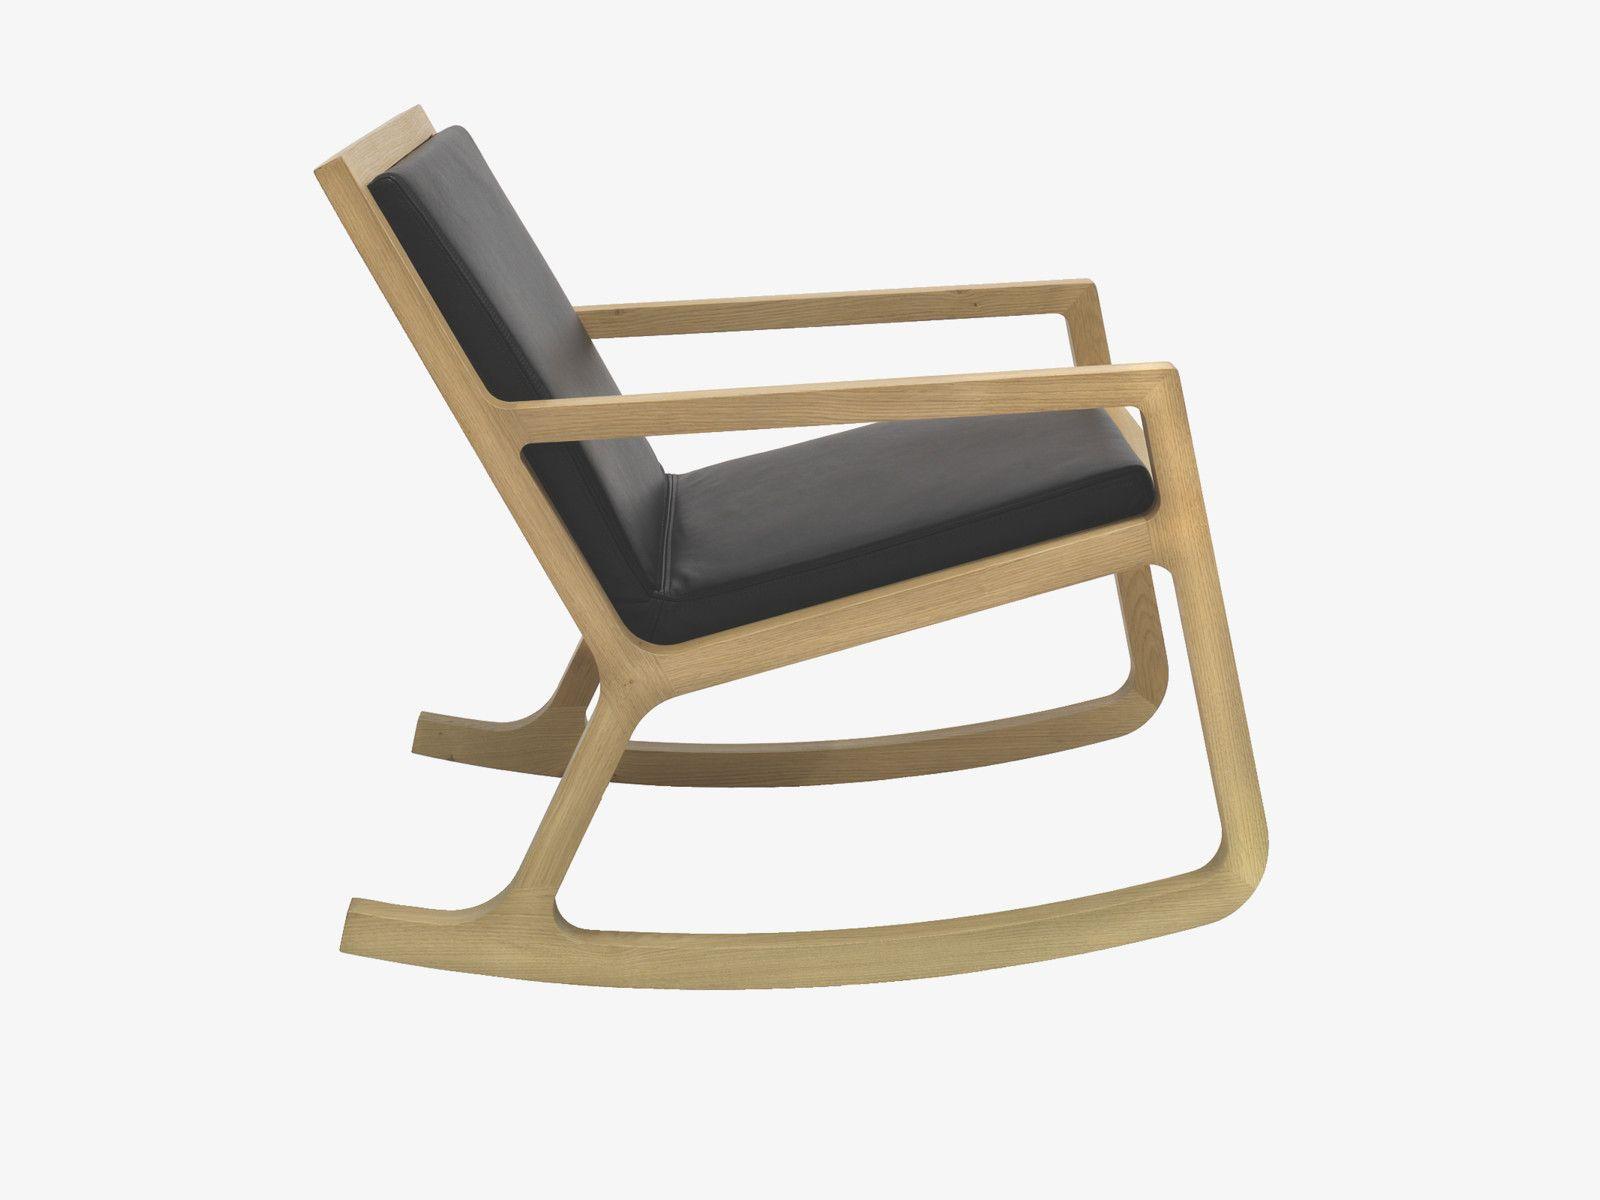 ROCKER BROWN Wood Rocking chair - Chairs- HabitatUK | For ...